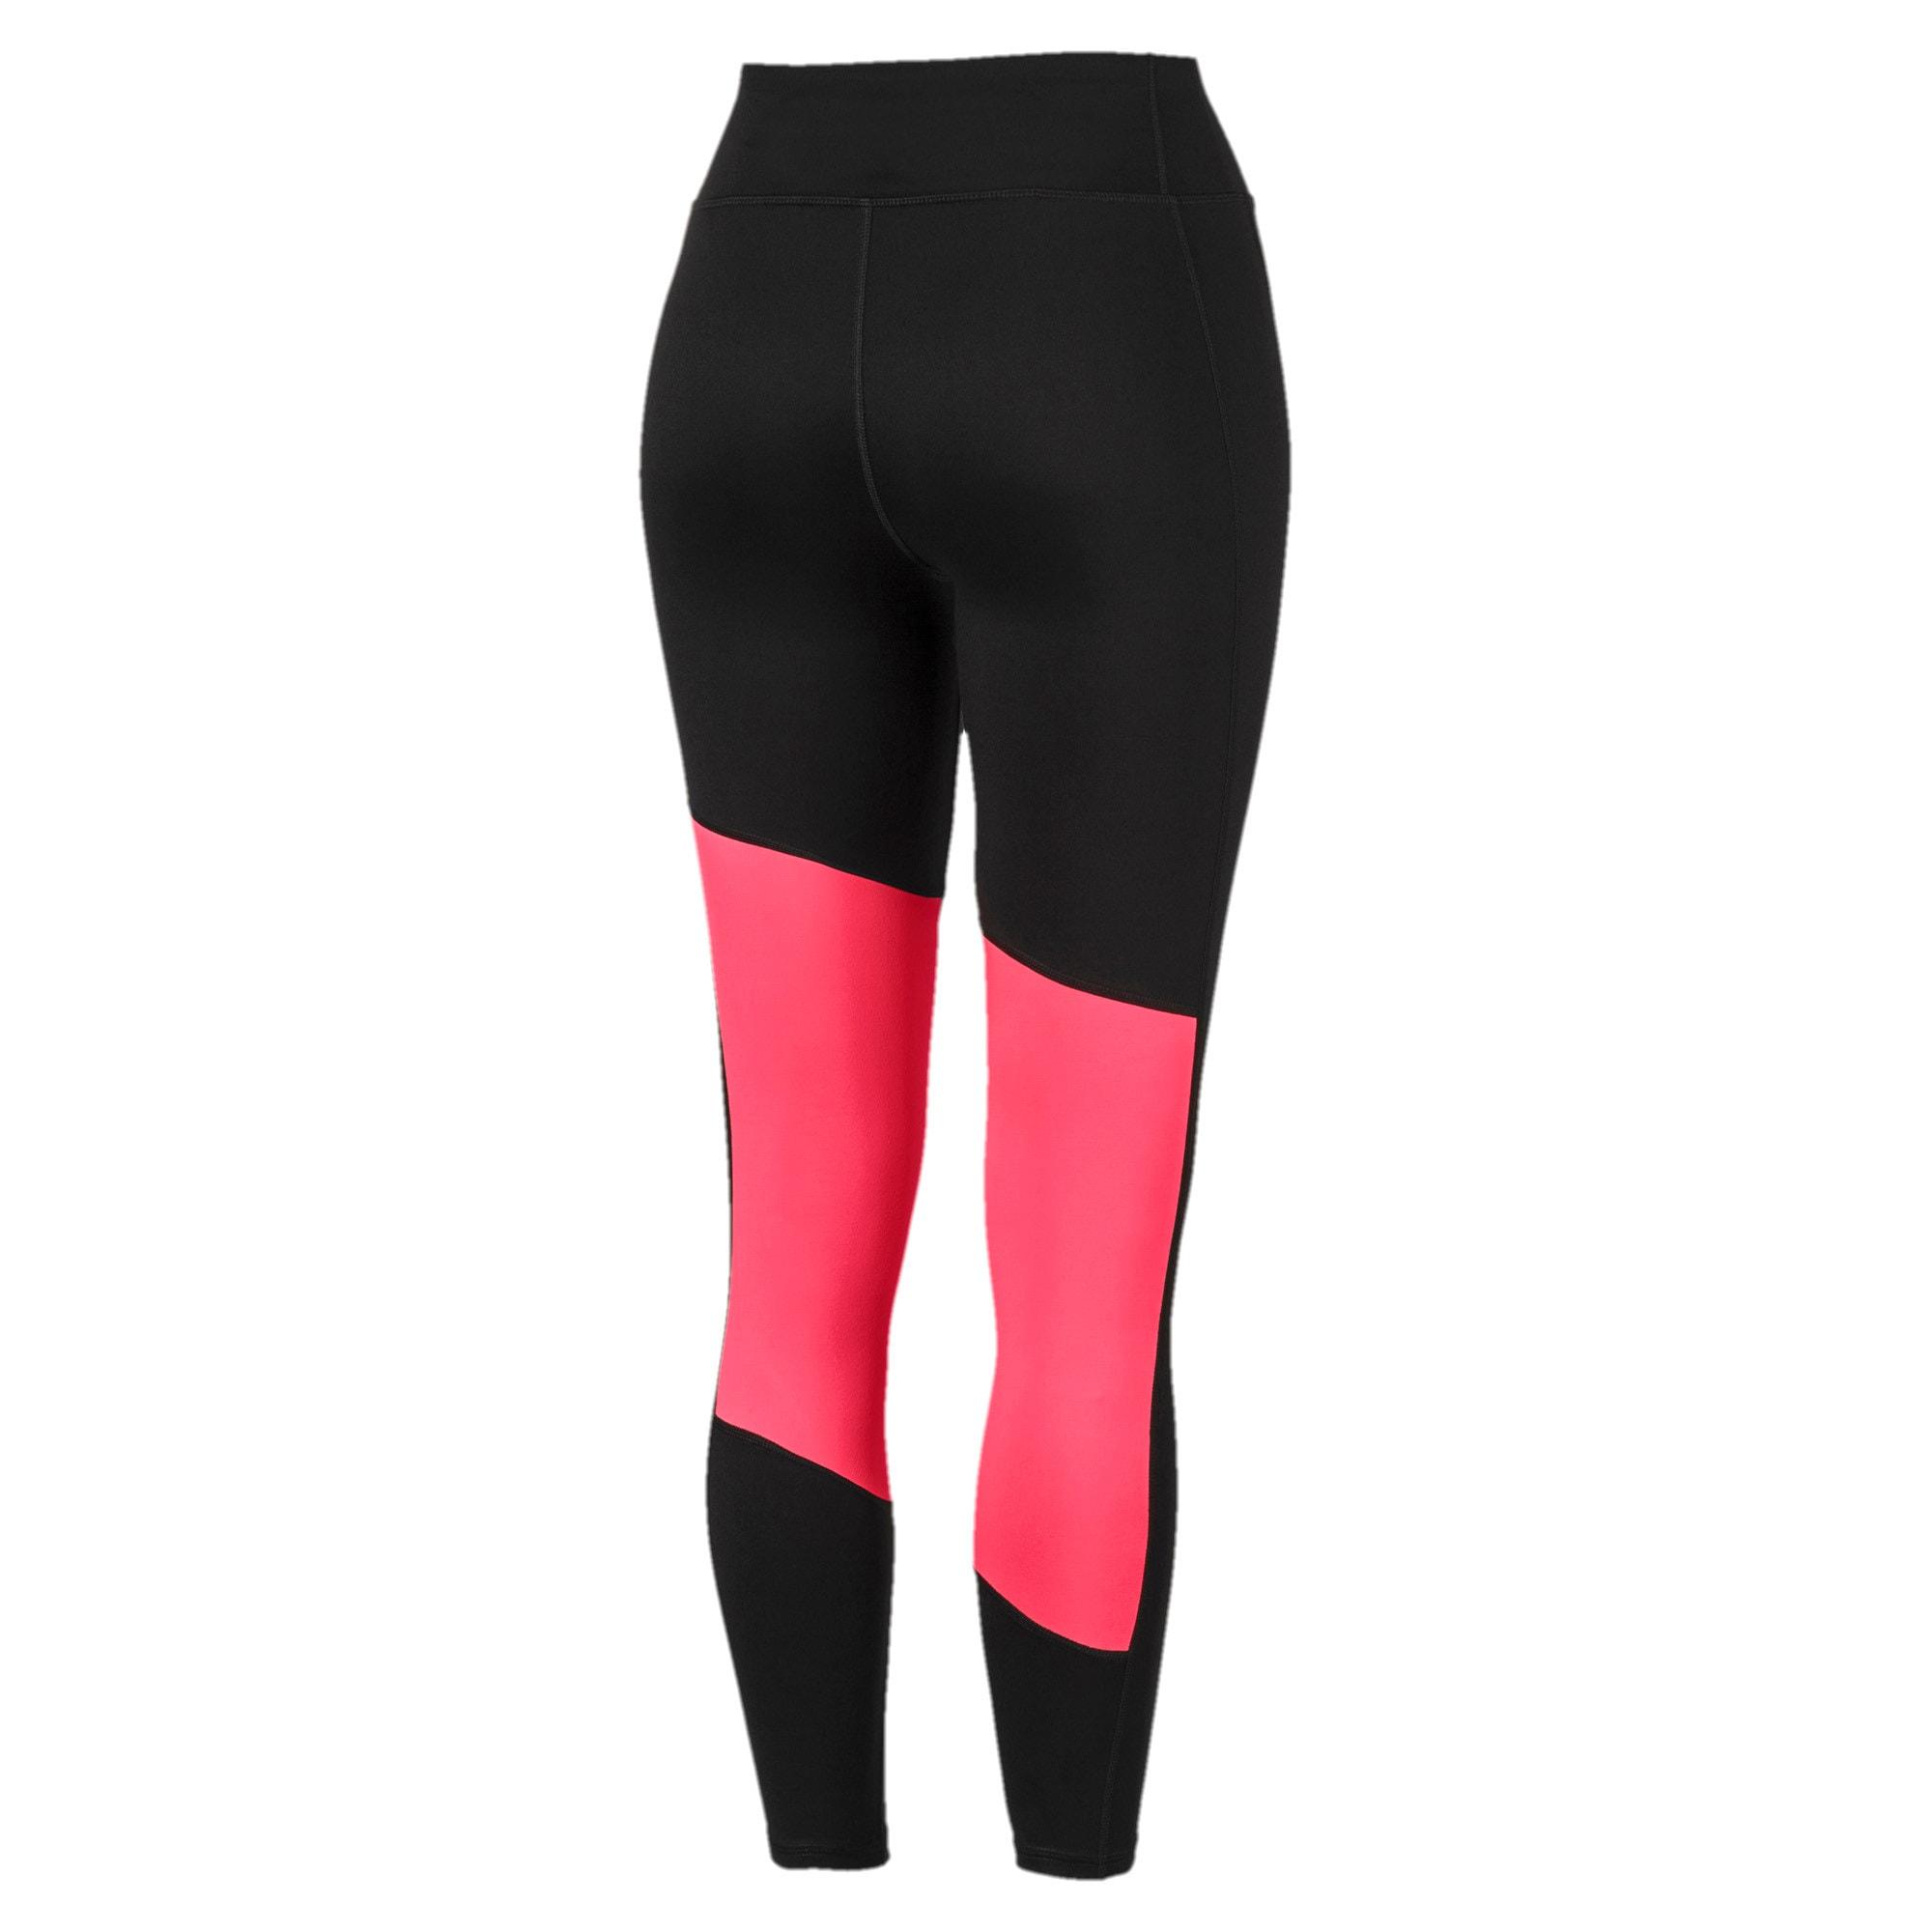 Thumbnail 5 of Logo Graphic Women's 7/8 Leggings, Puma Black-Pink Alert, medium